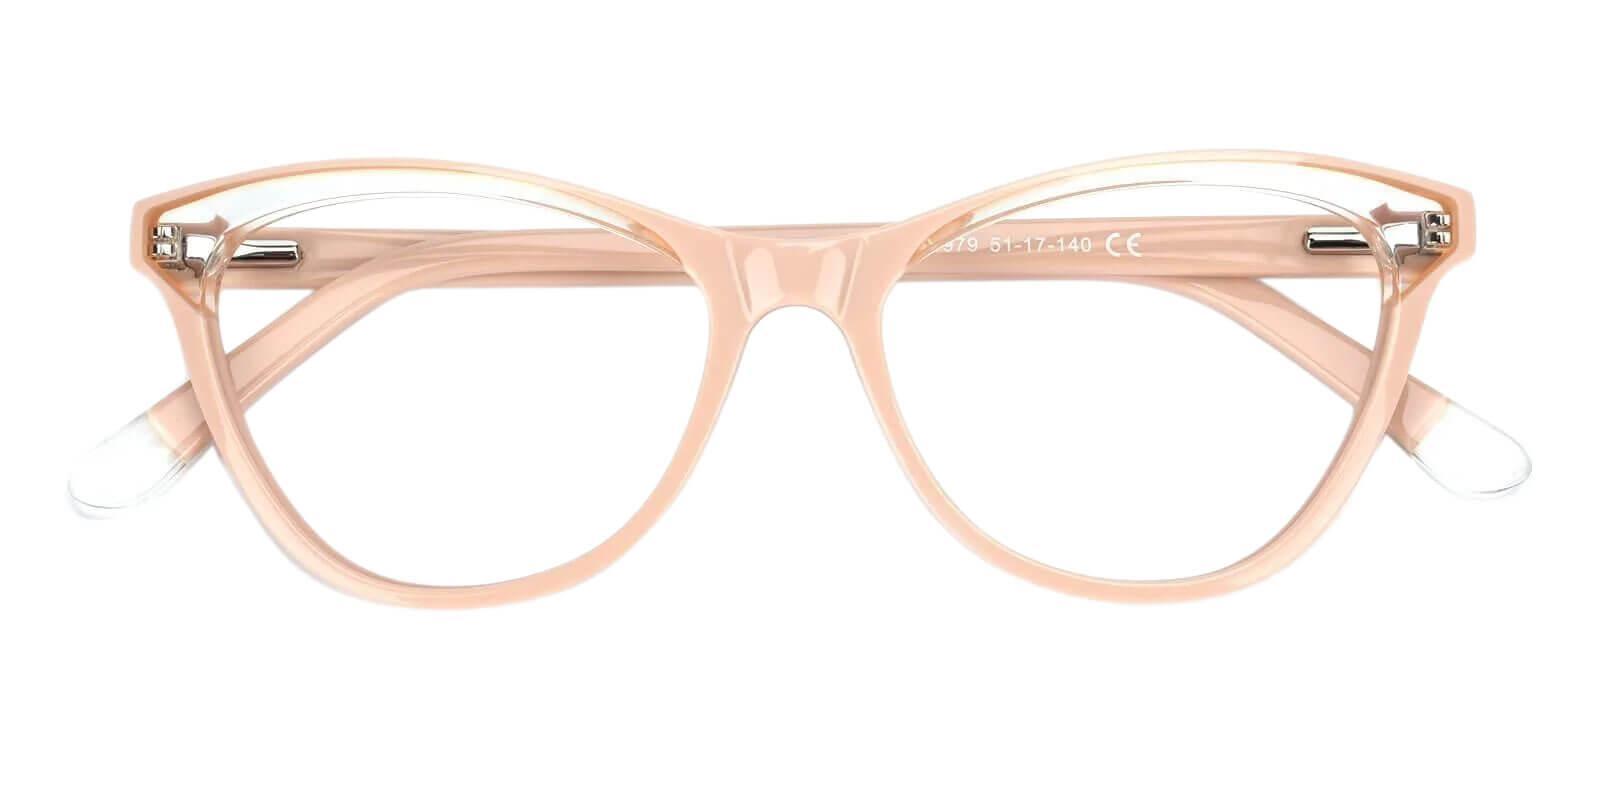 Luznic Pink Acetate Eyeglasses , UniversalBridgeFit Frames from ABBE Glasses